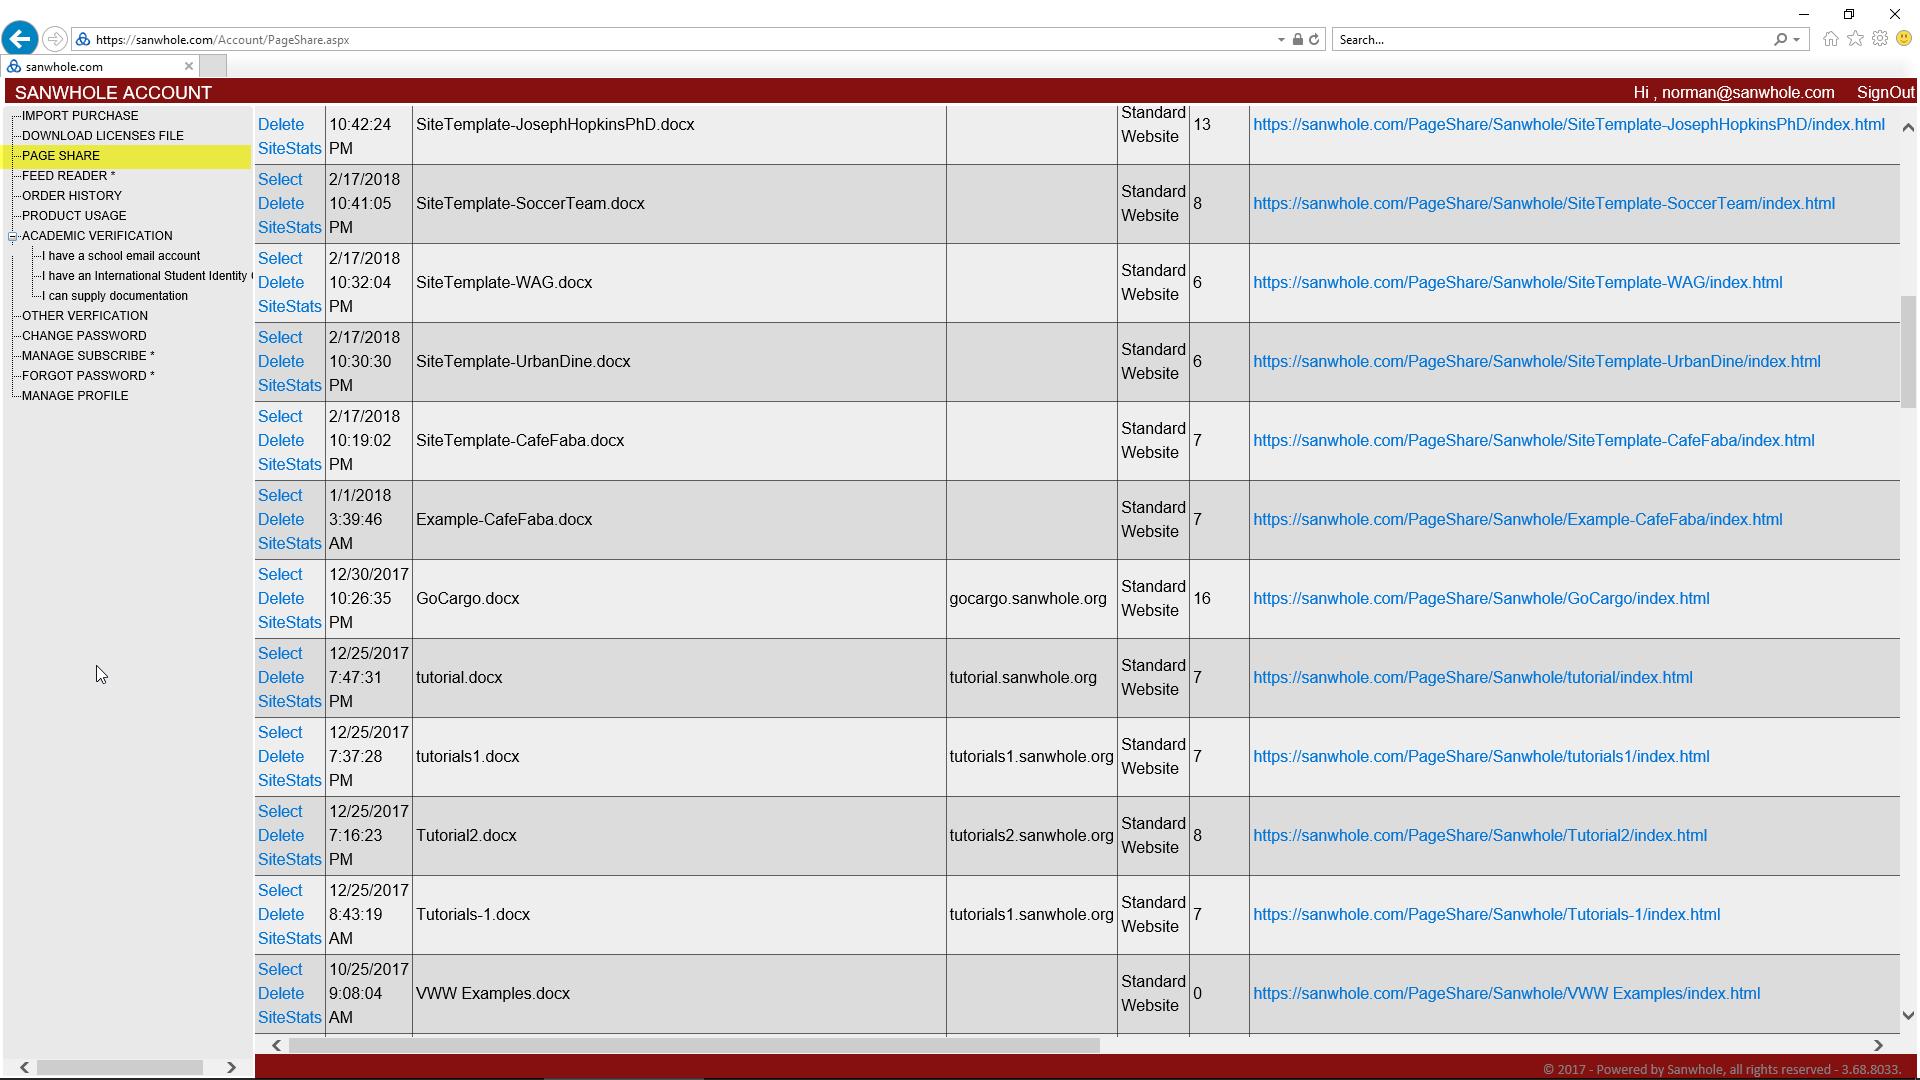 Website Scraping Software, PageShare Web Hosting 2X3 - 2 websites 3 years web hosting Screenshot